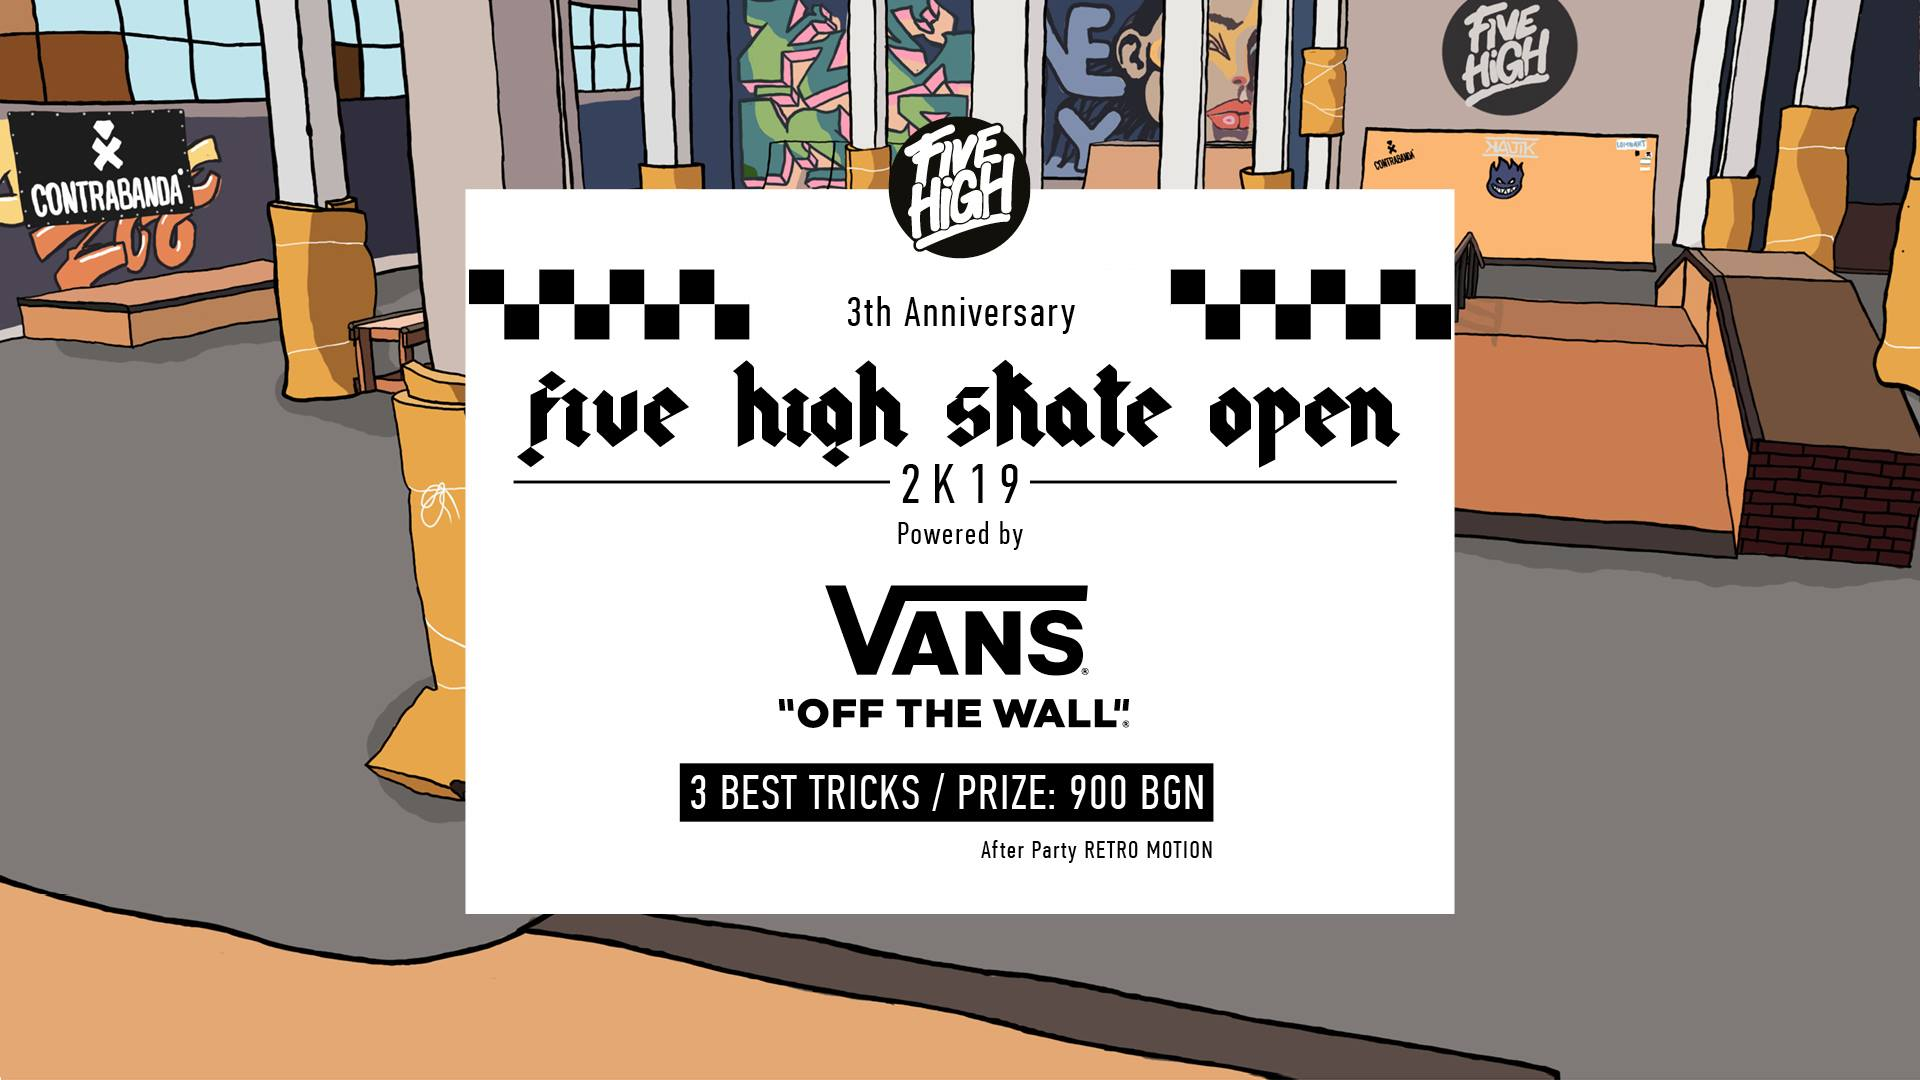 Five High SKATE OPEN 2K19